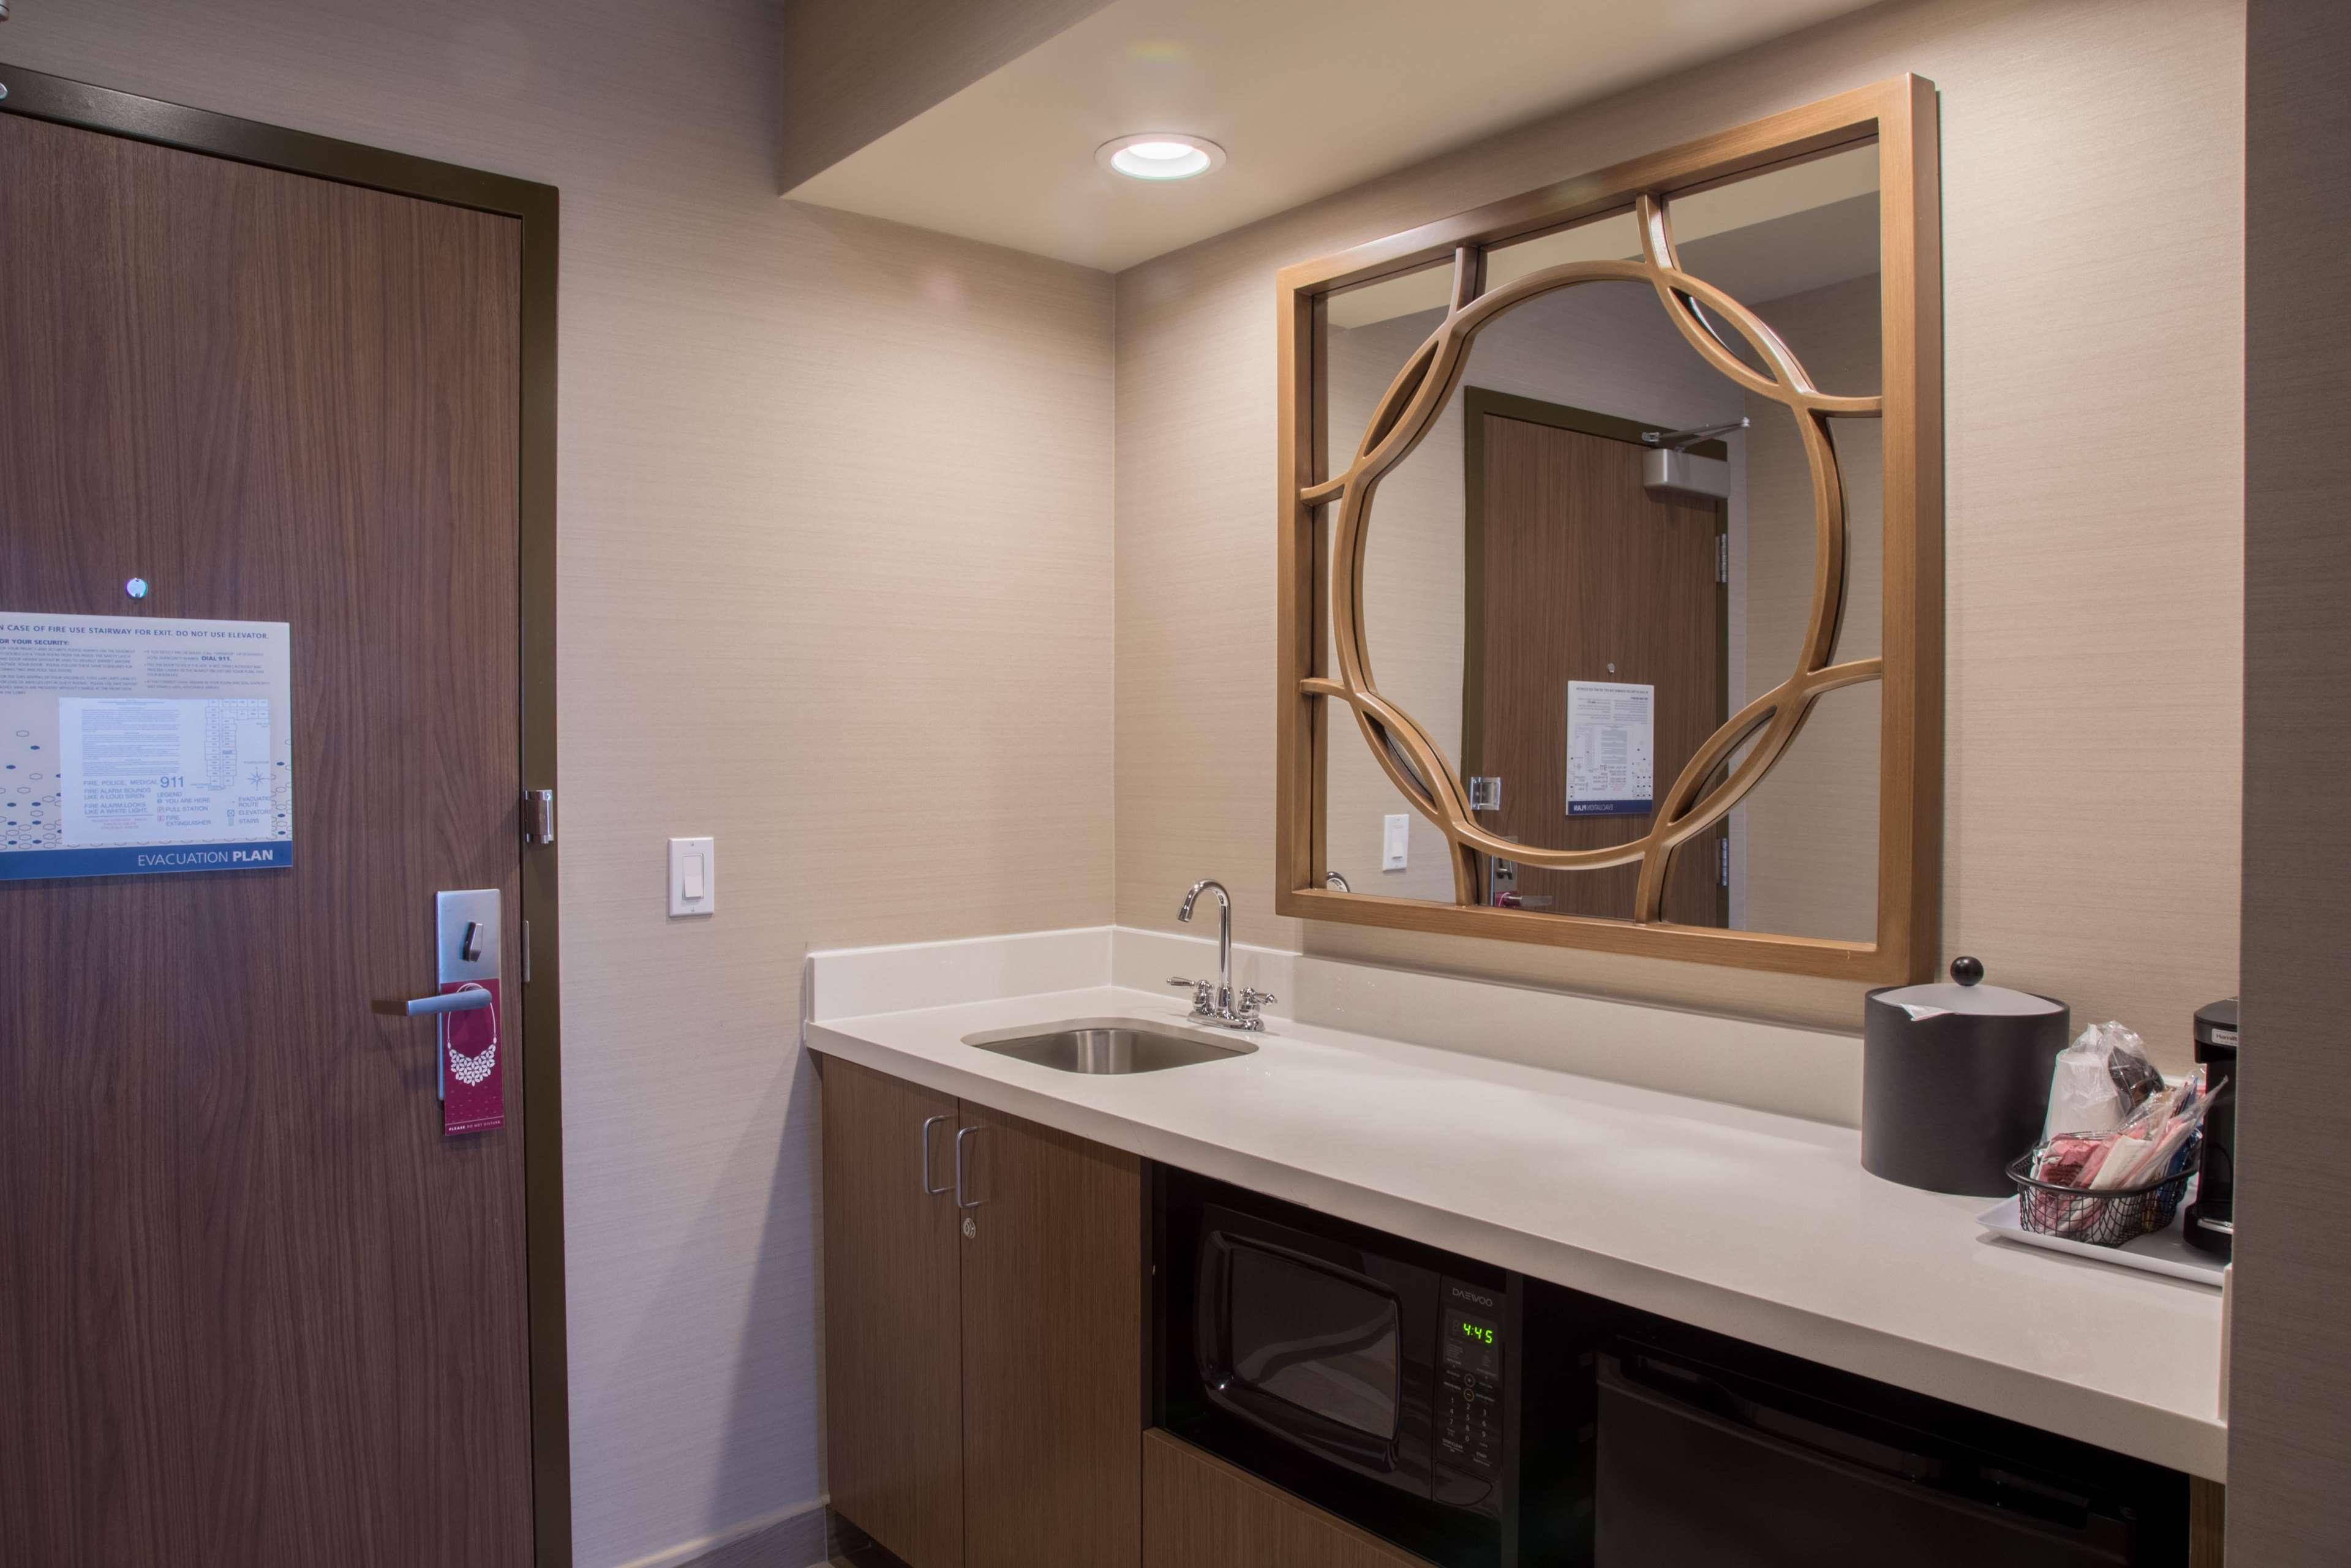 Hampton Inn & Suites Murrieta Temecula image 29